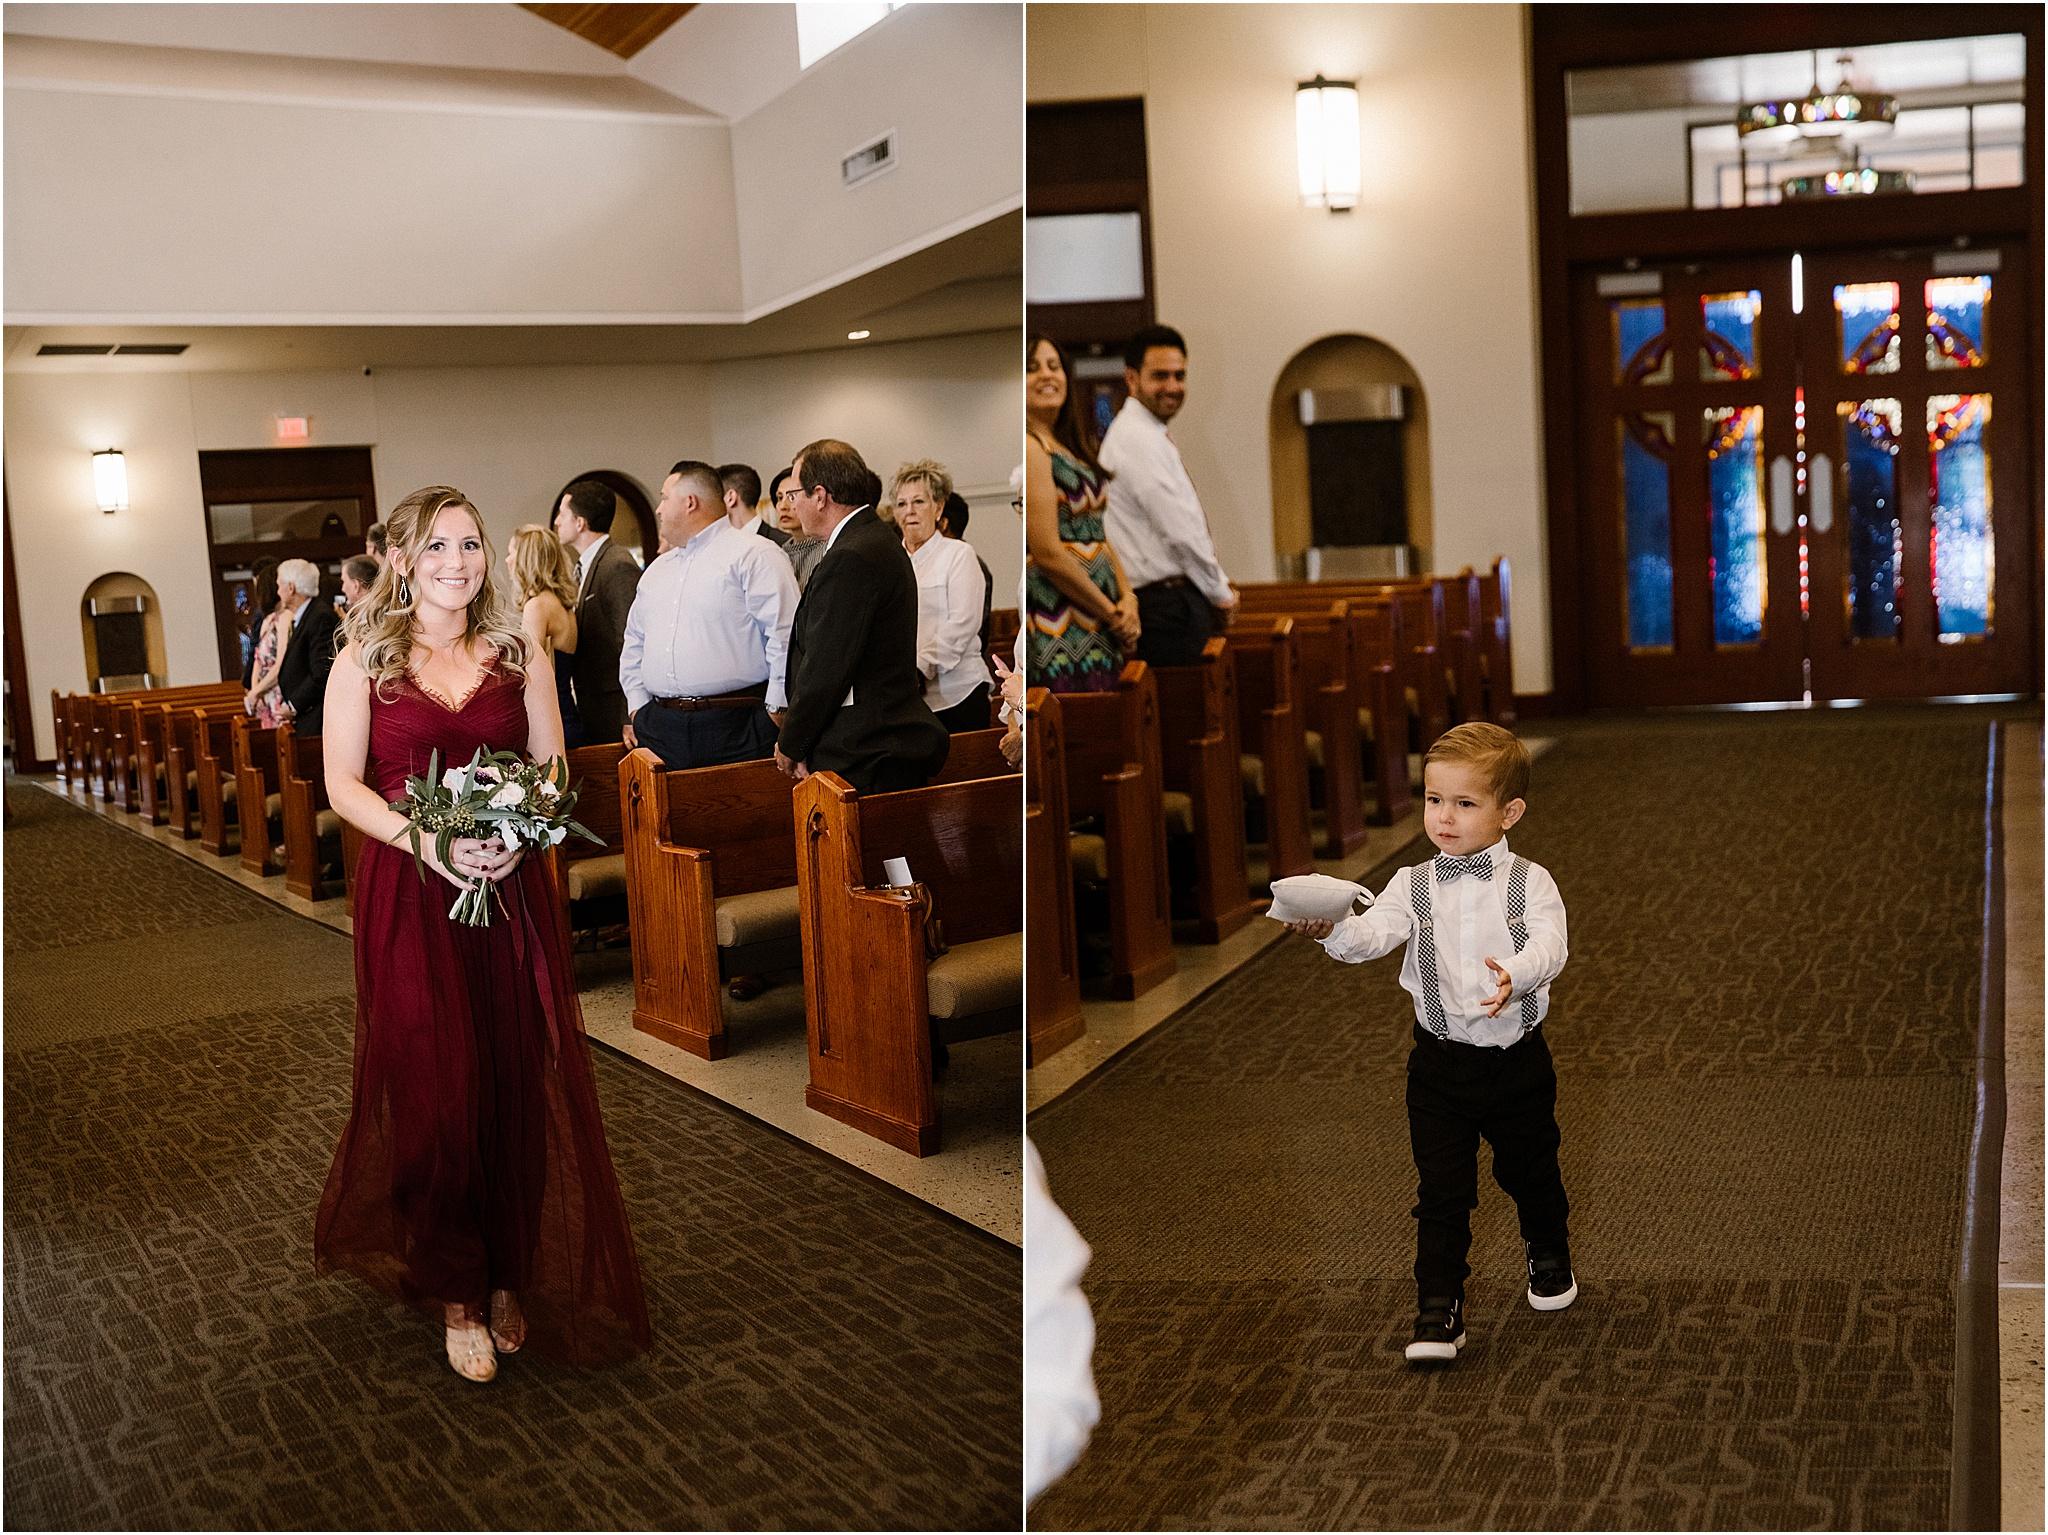 JENNA_JEROME_BLUE ROSE PHOTOGRAPHY_ABQ WEDDING_15